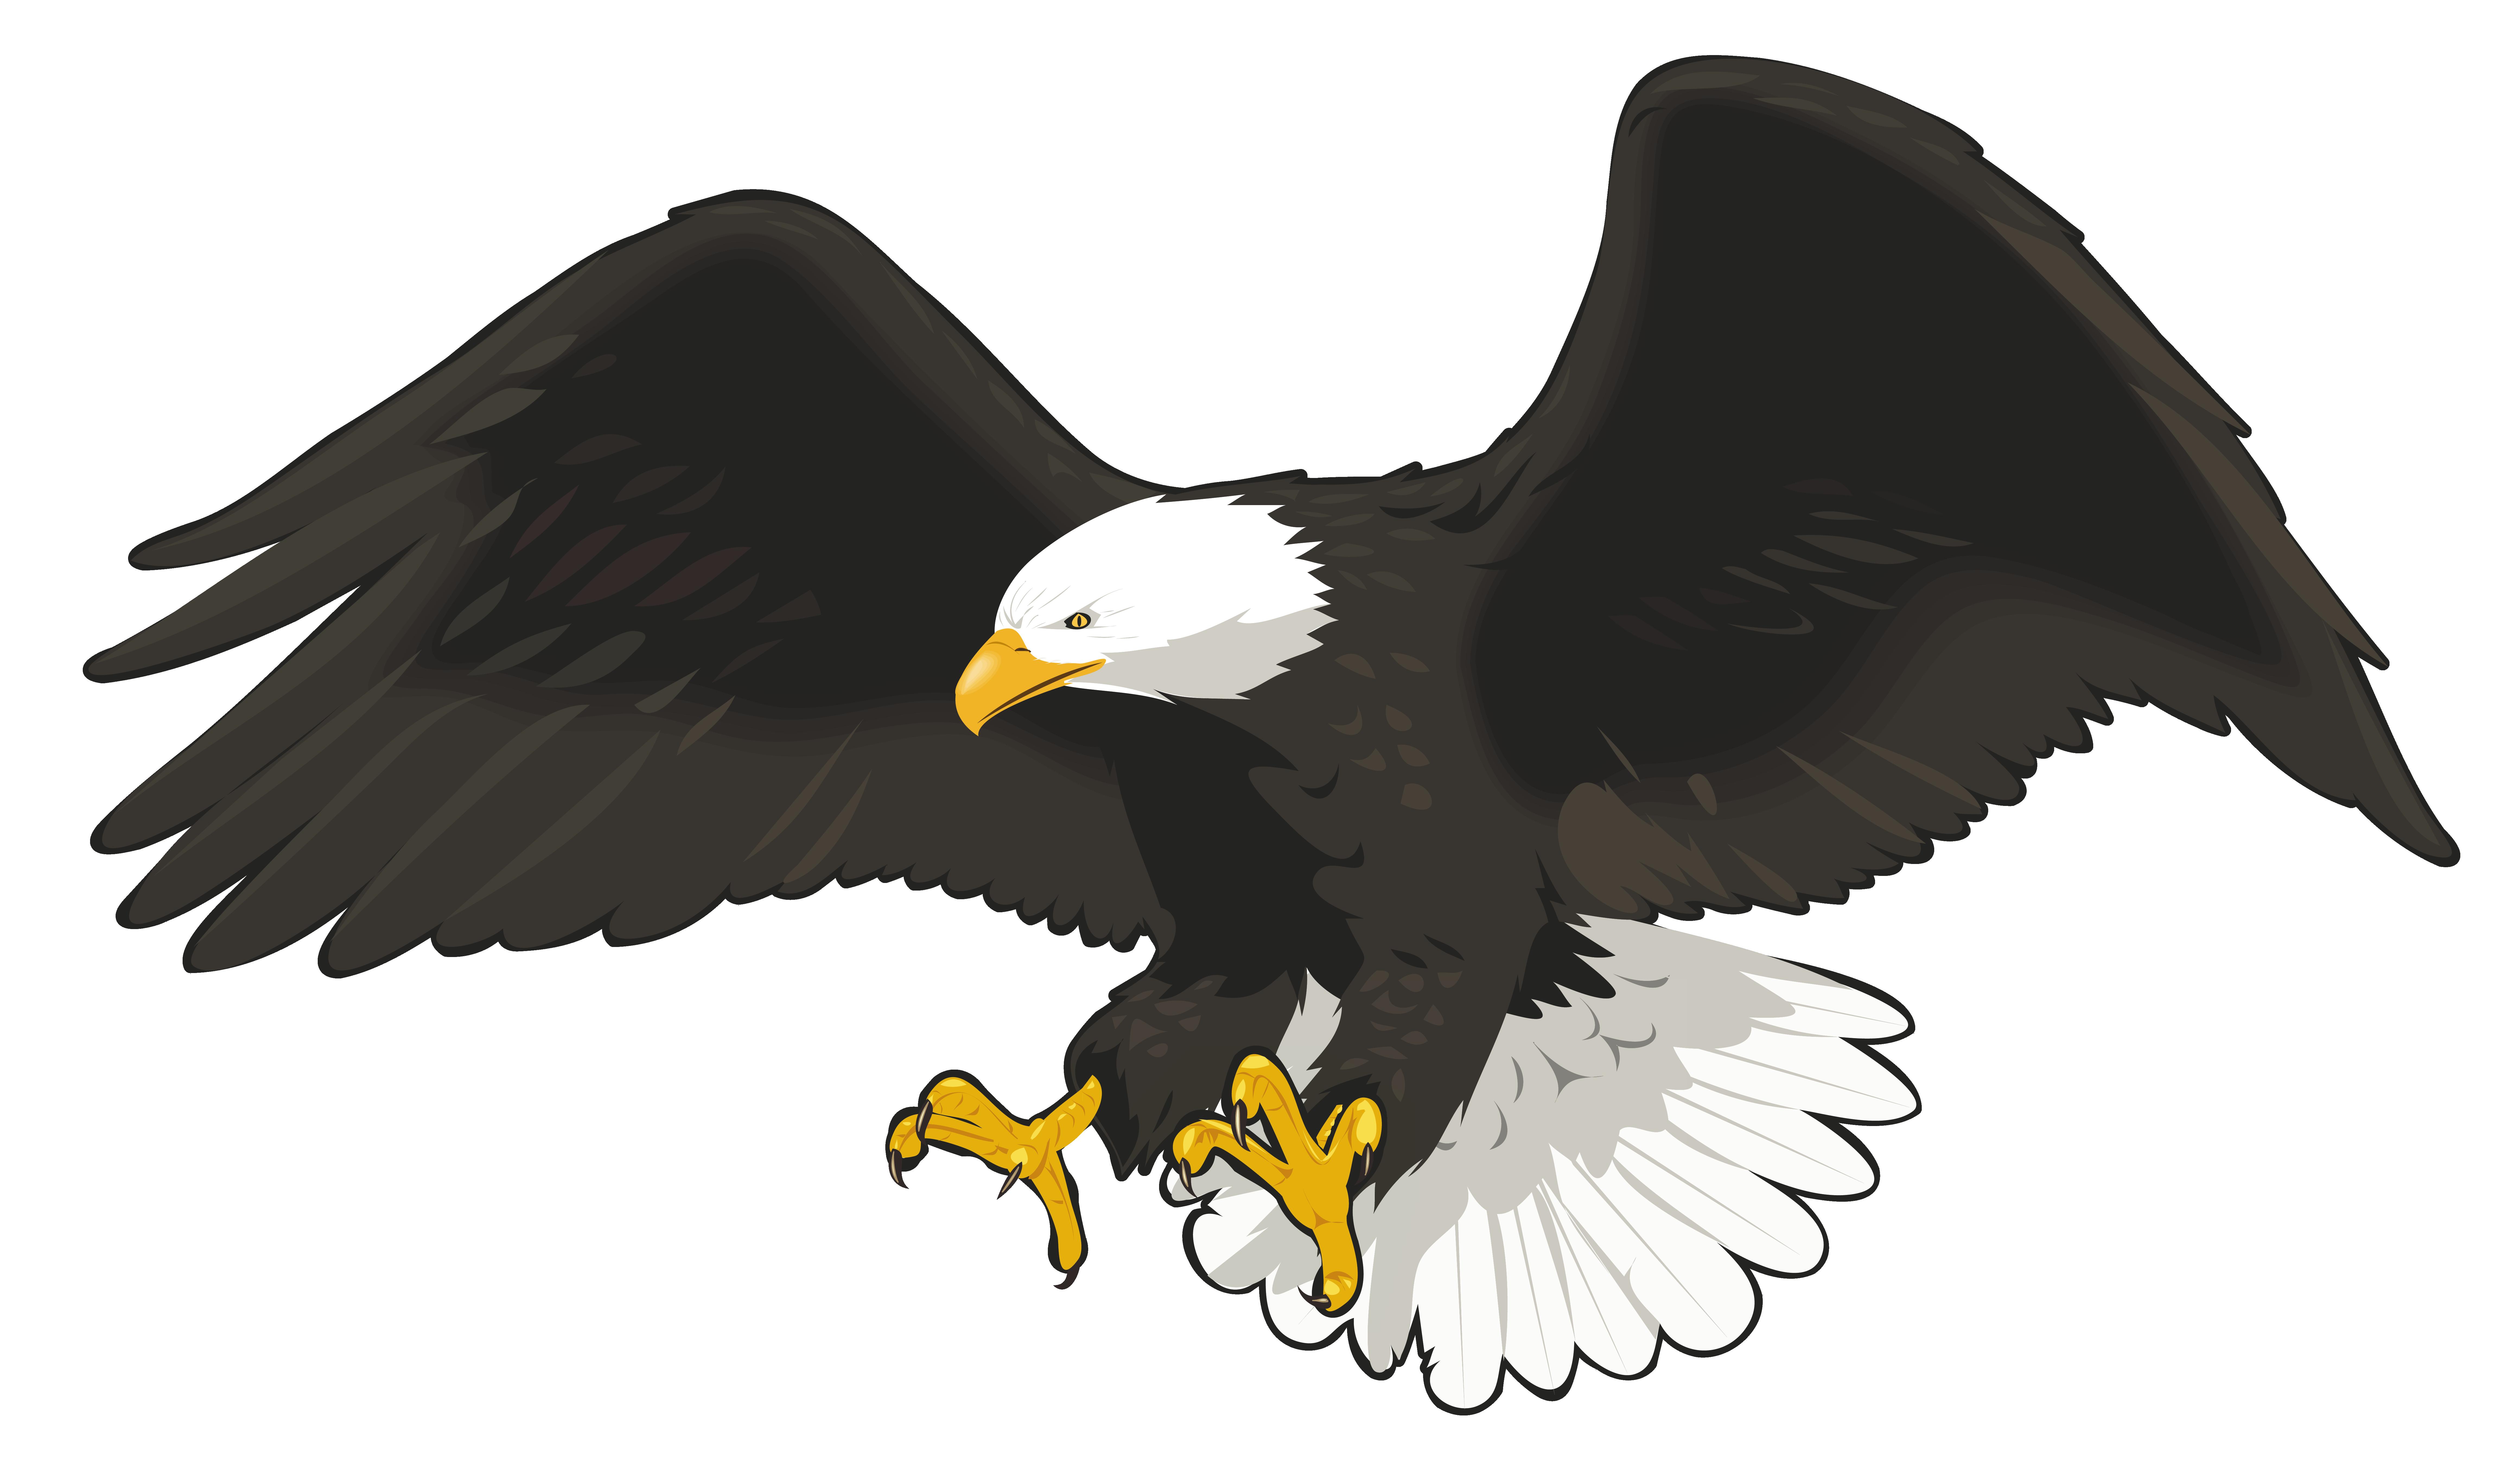 Eagle PNG PNG Clip Art Image.